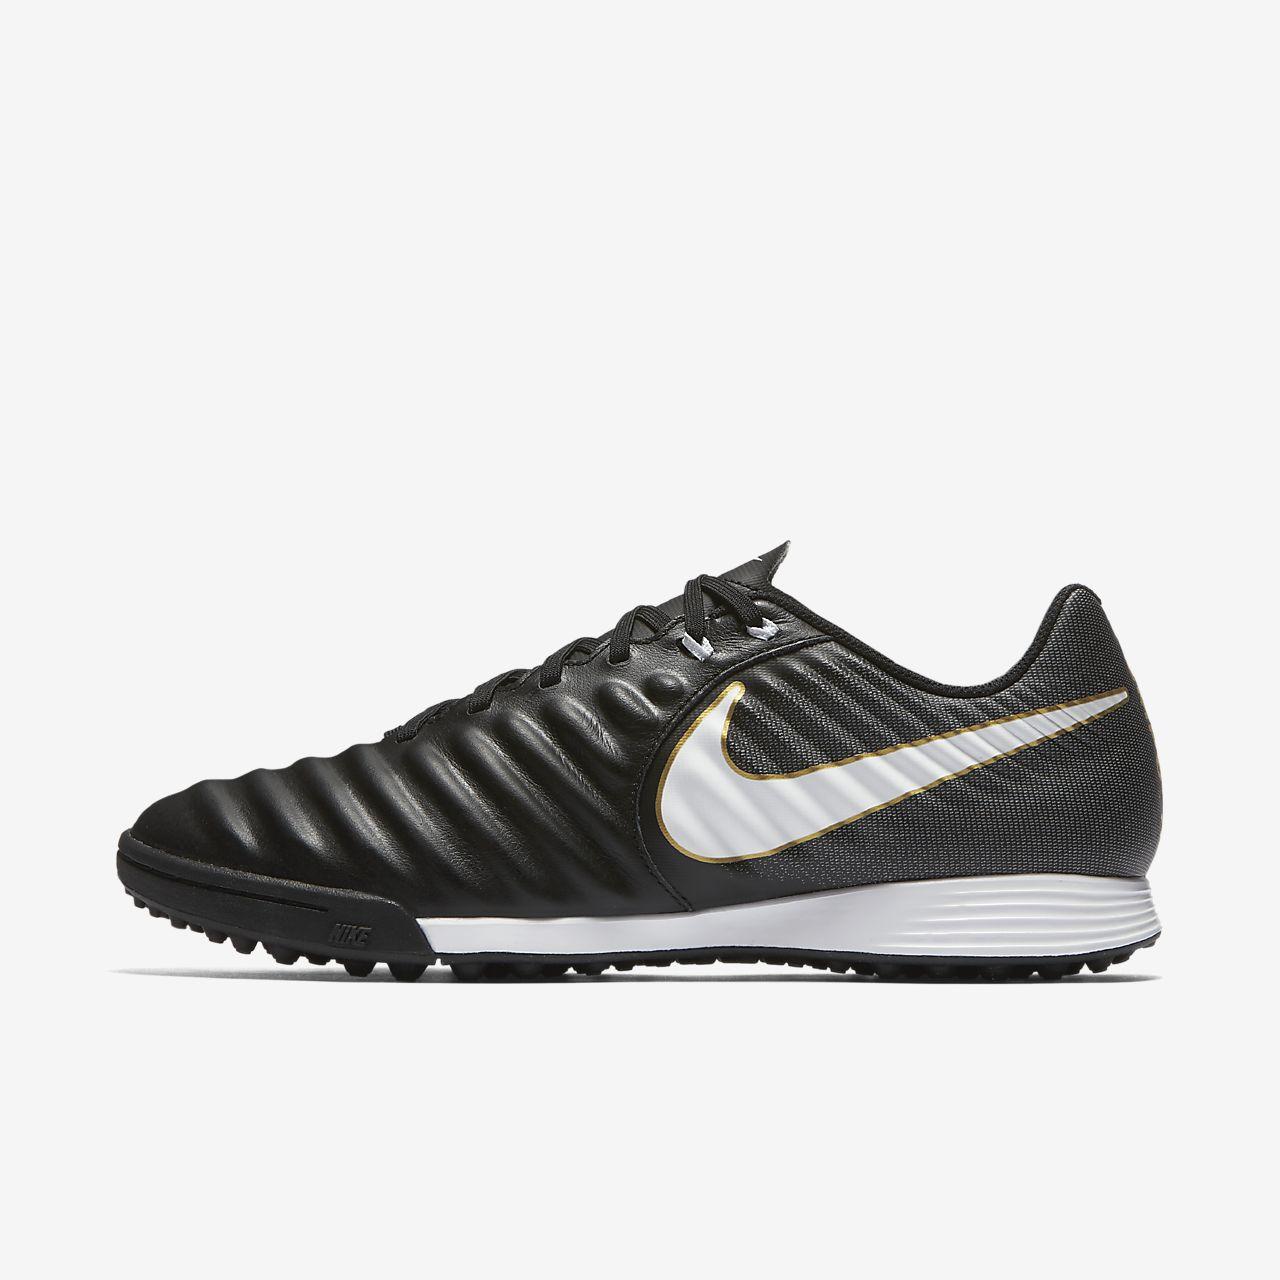 TiempoX Ligera IV TF Nike n1UAD4Em